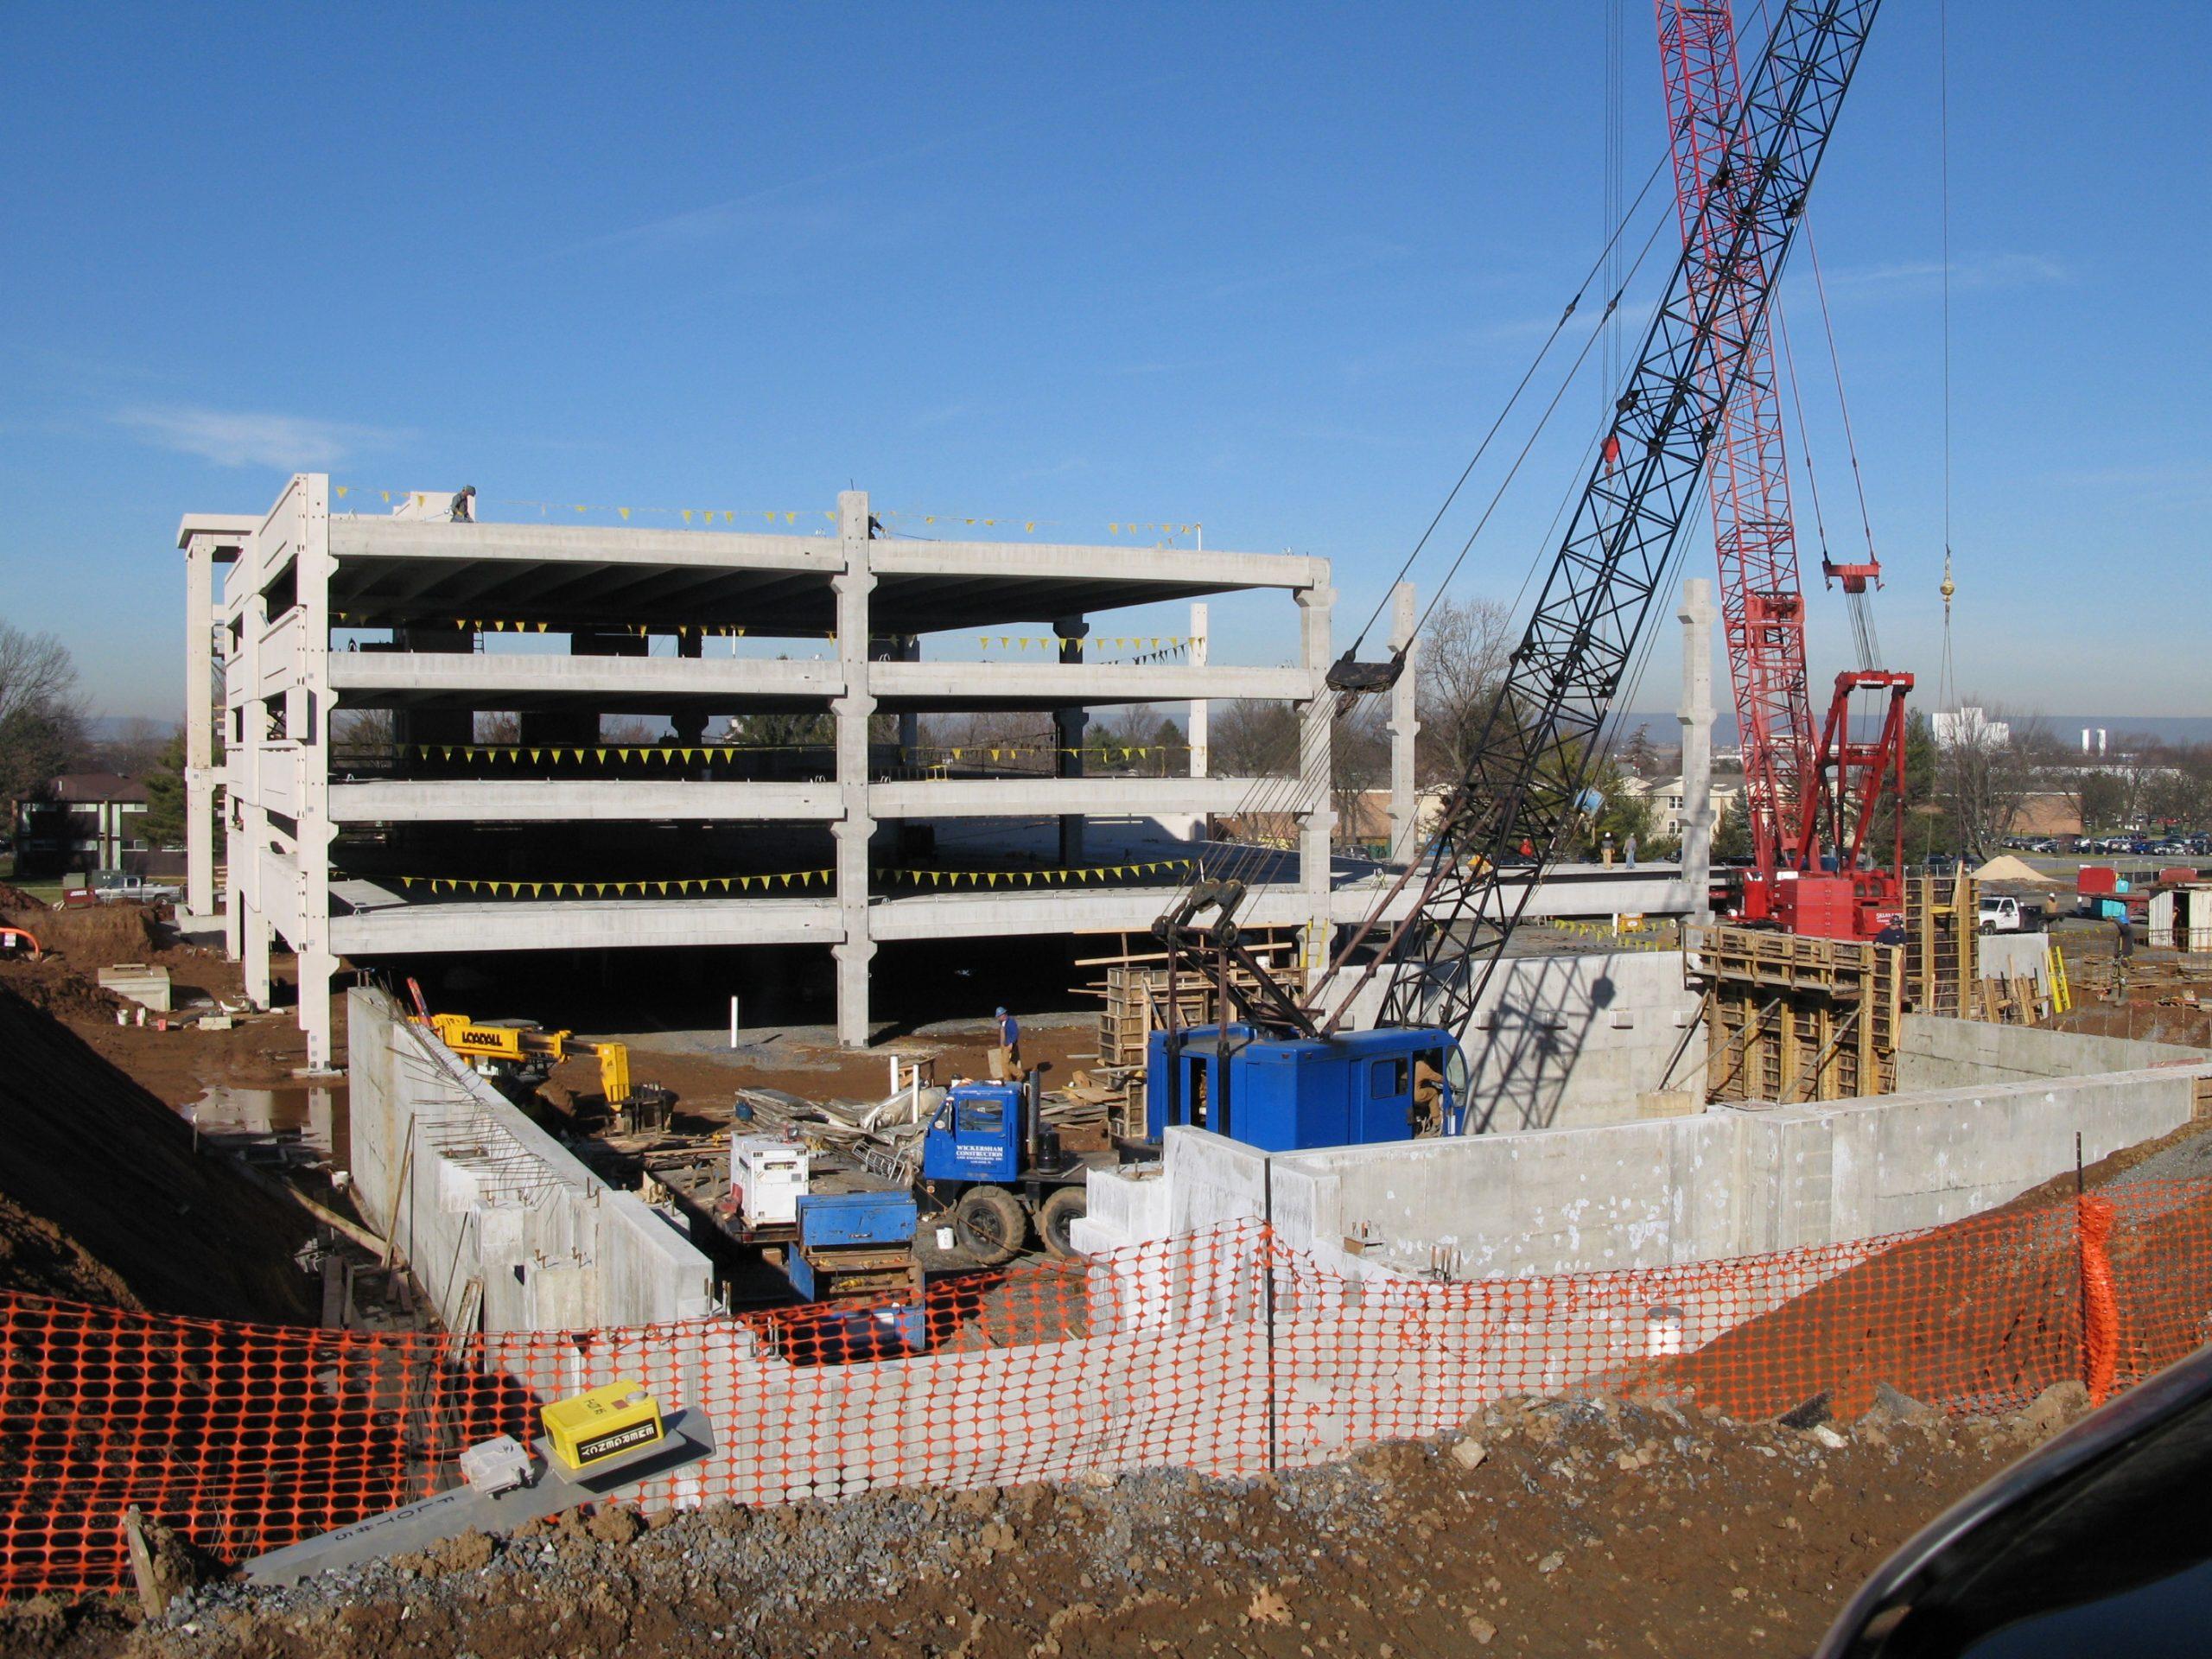 Hershey Medical Center Parking Garage during construction